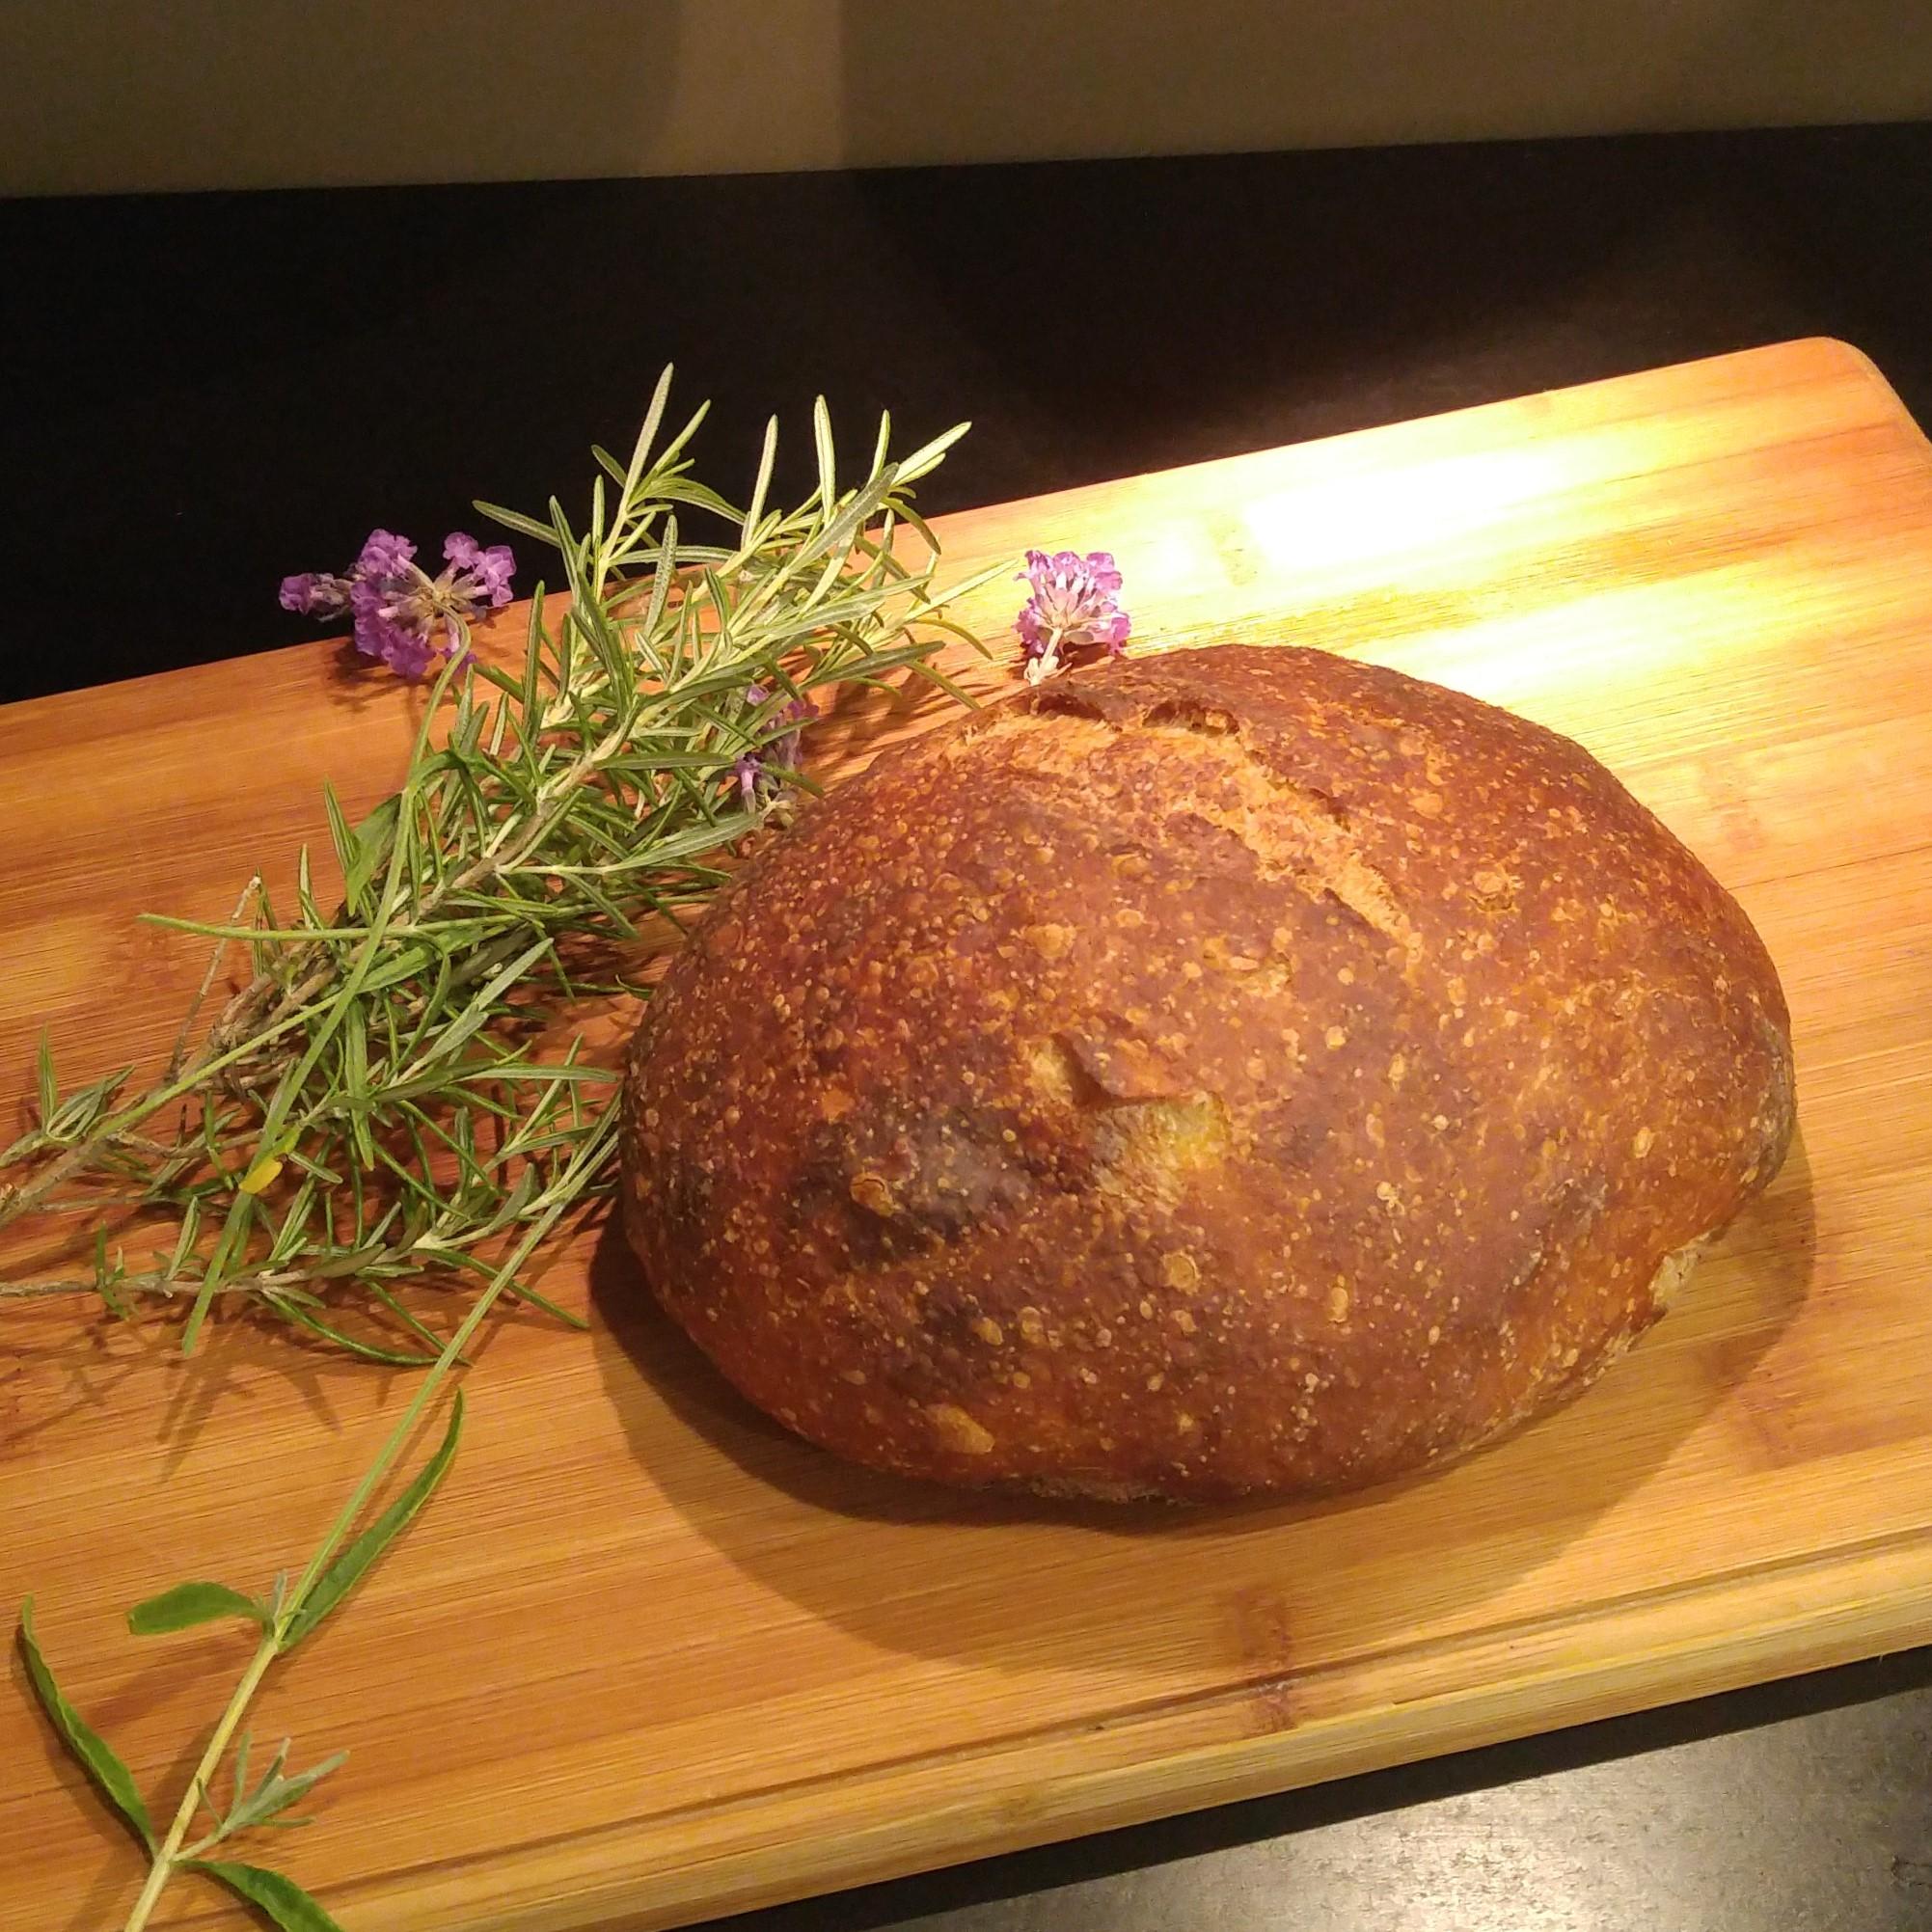 L.J's bread..Rosemary!